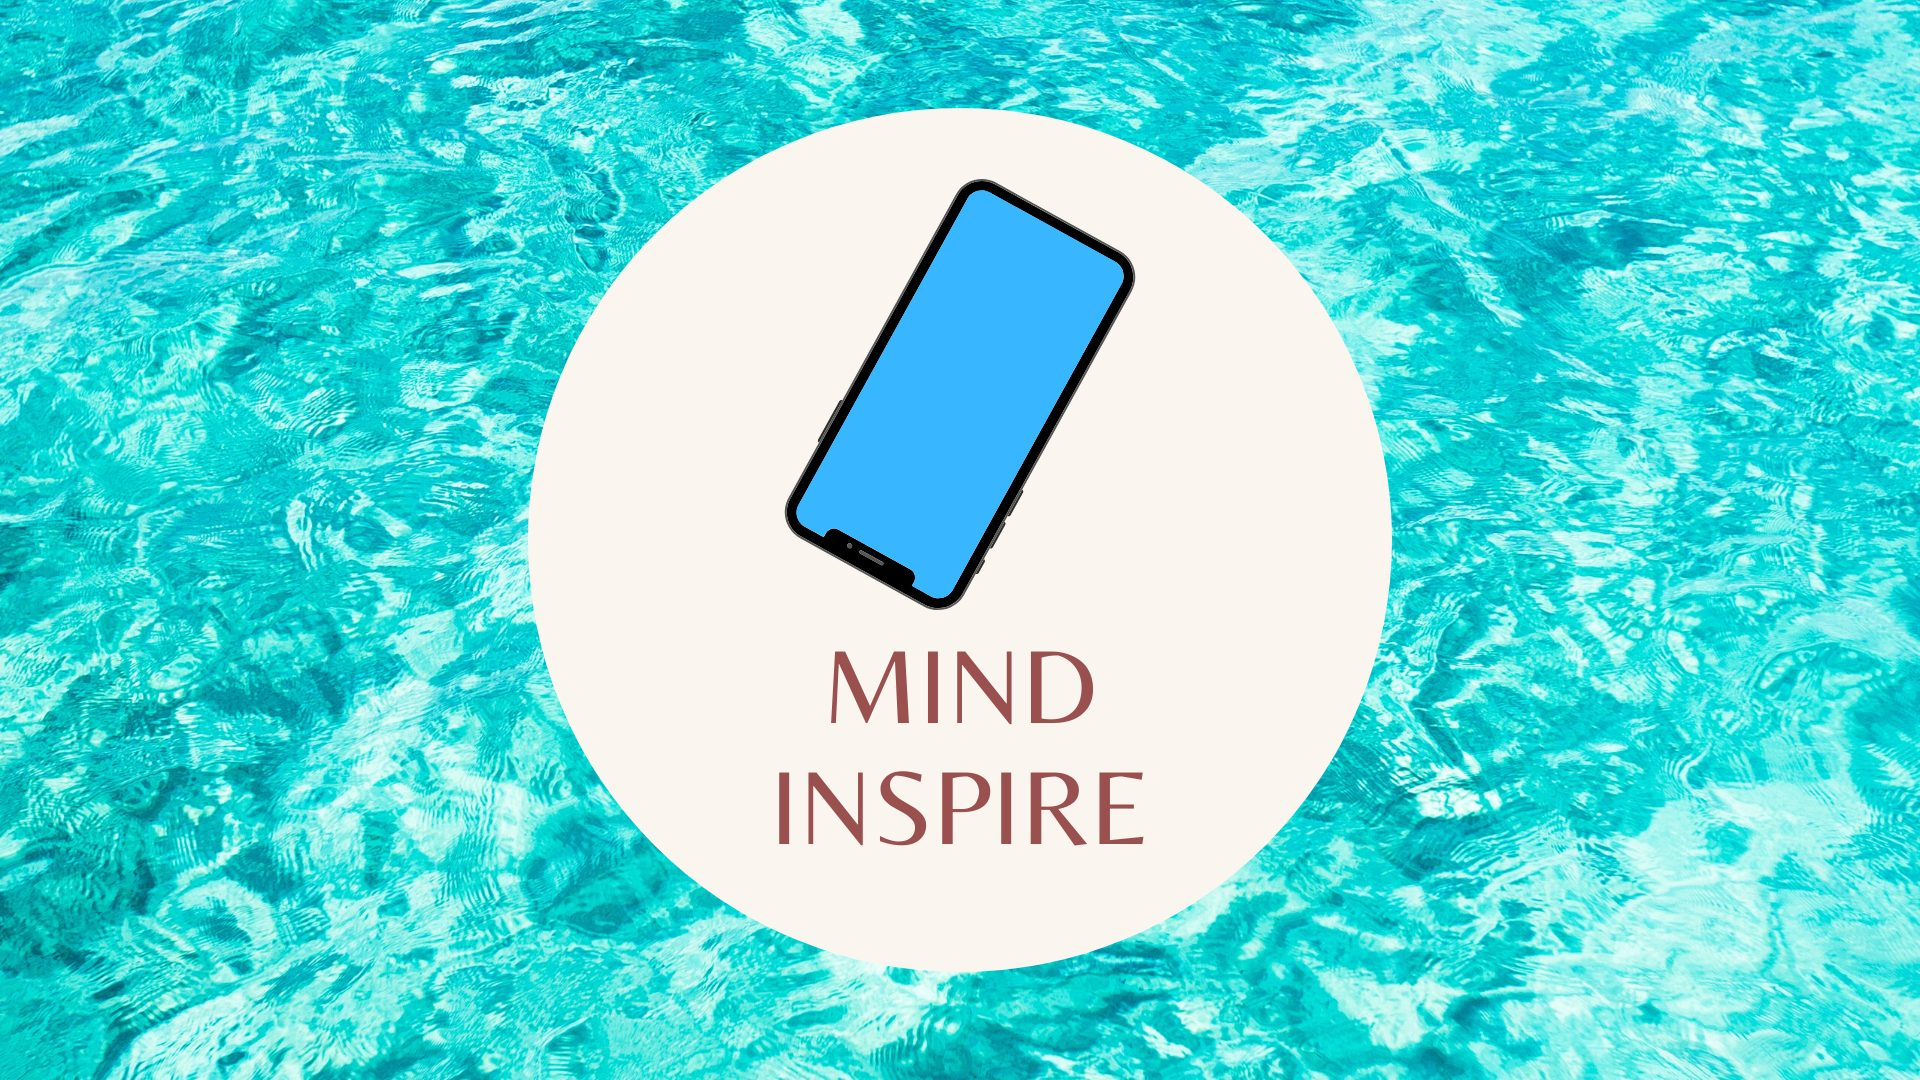 Mind inspire